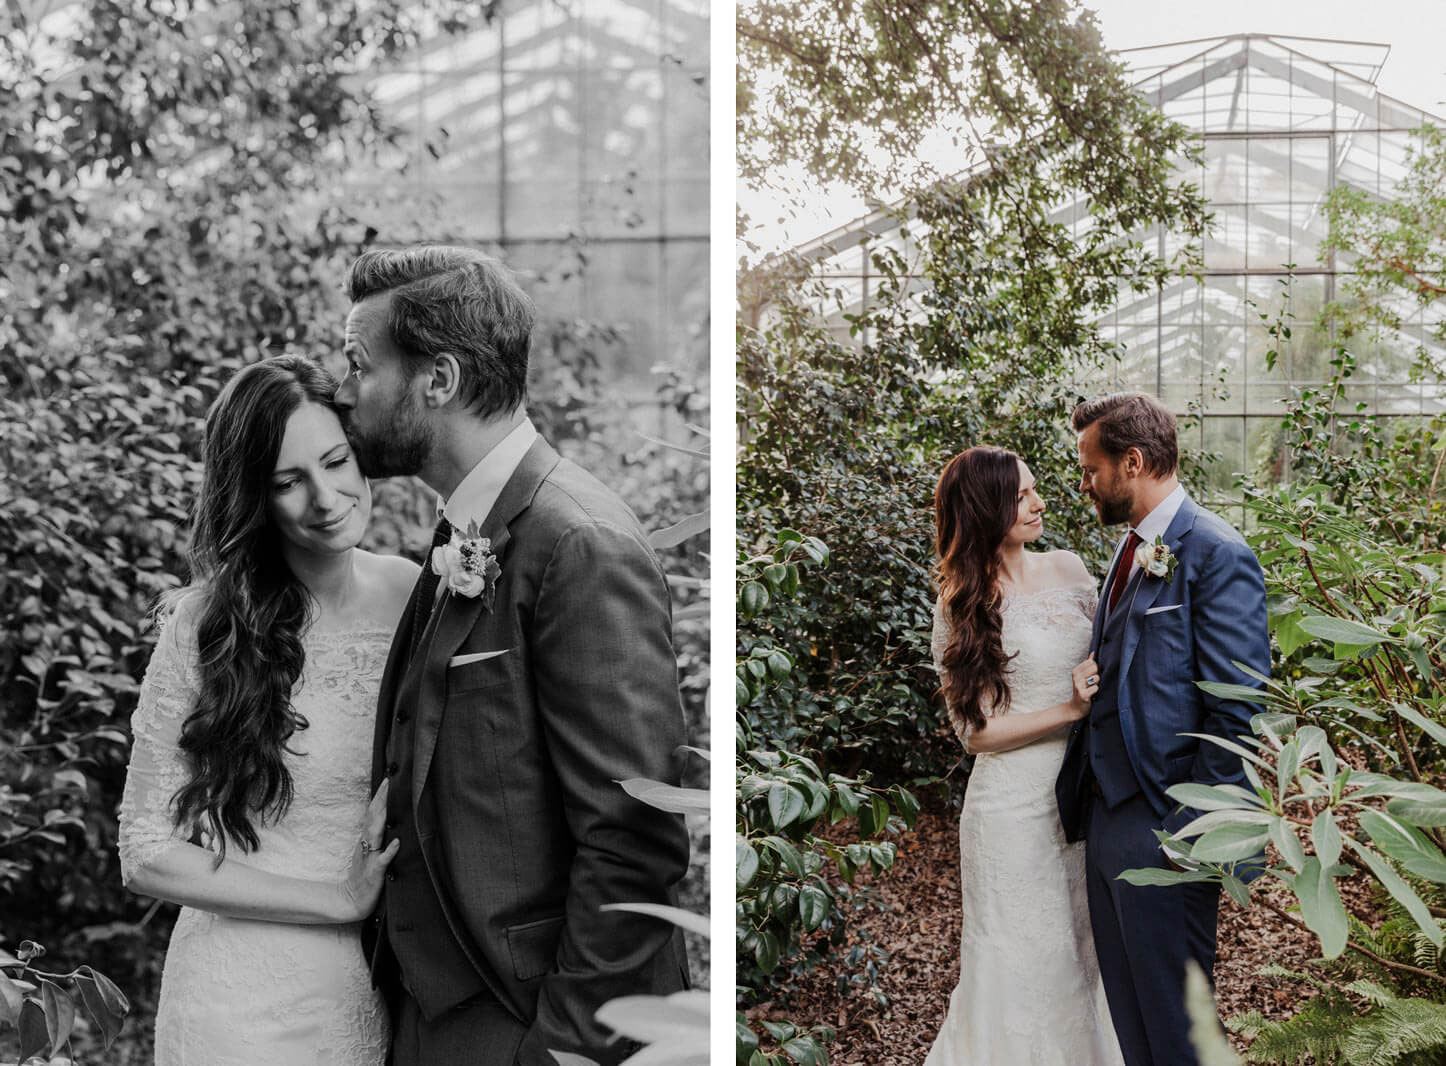 Brautpaarshooting im Gewächshaus